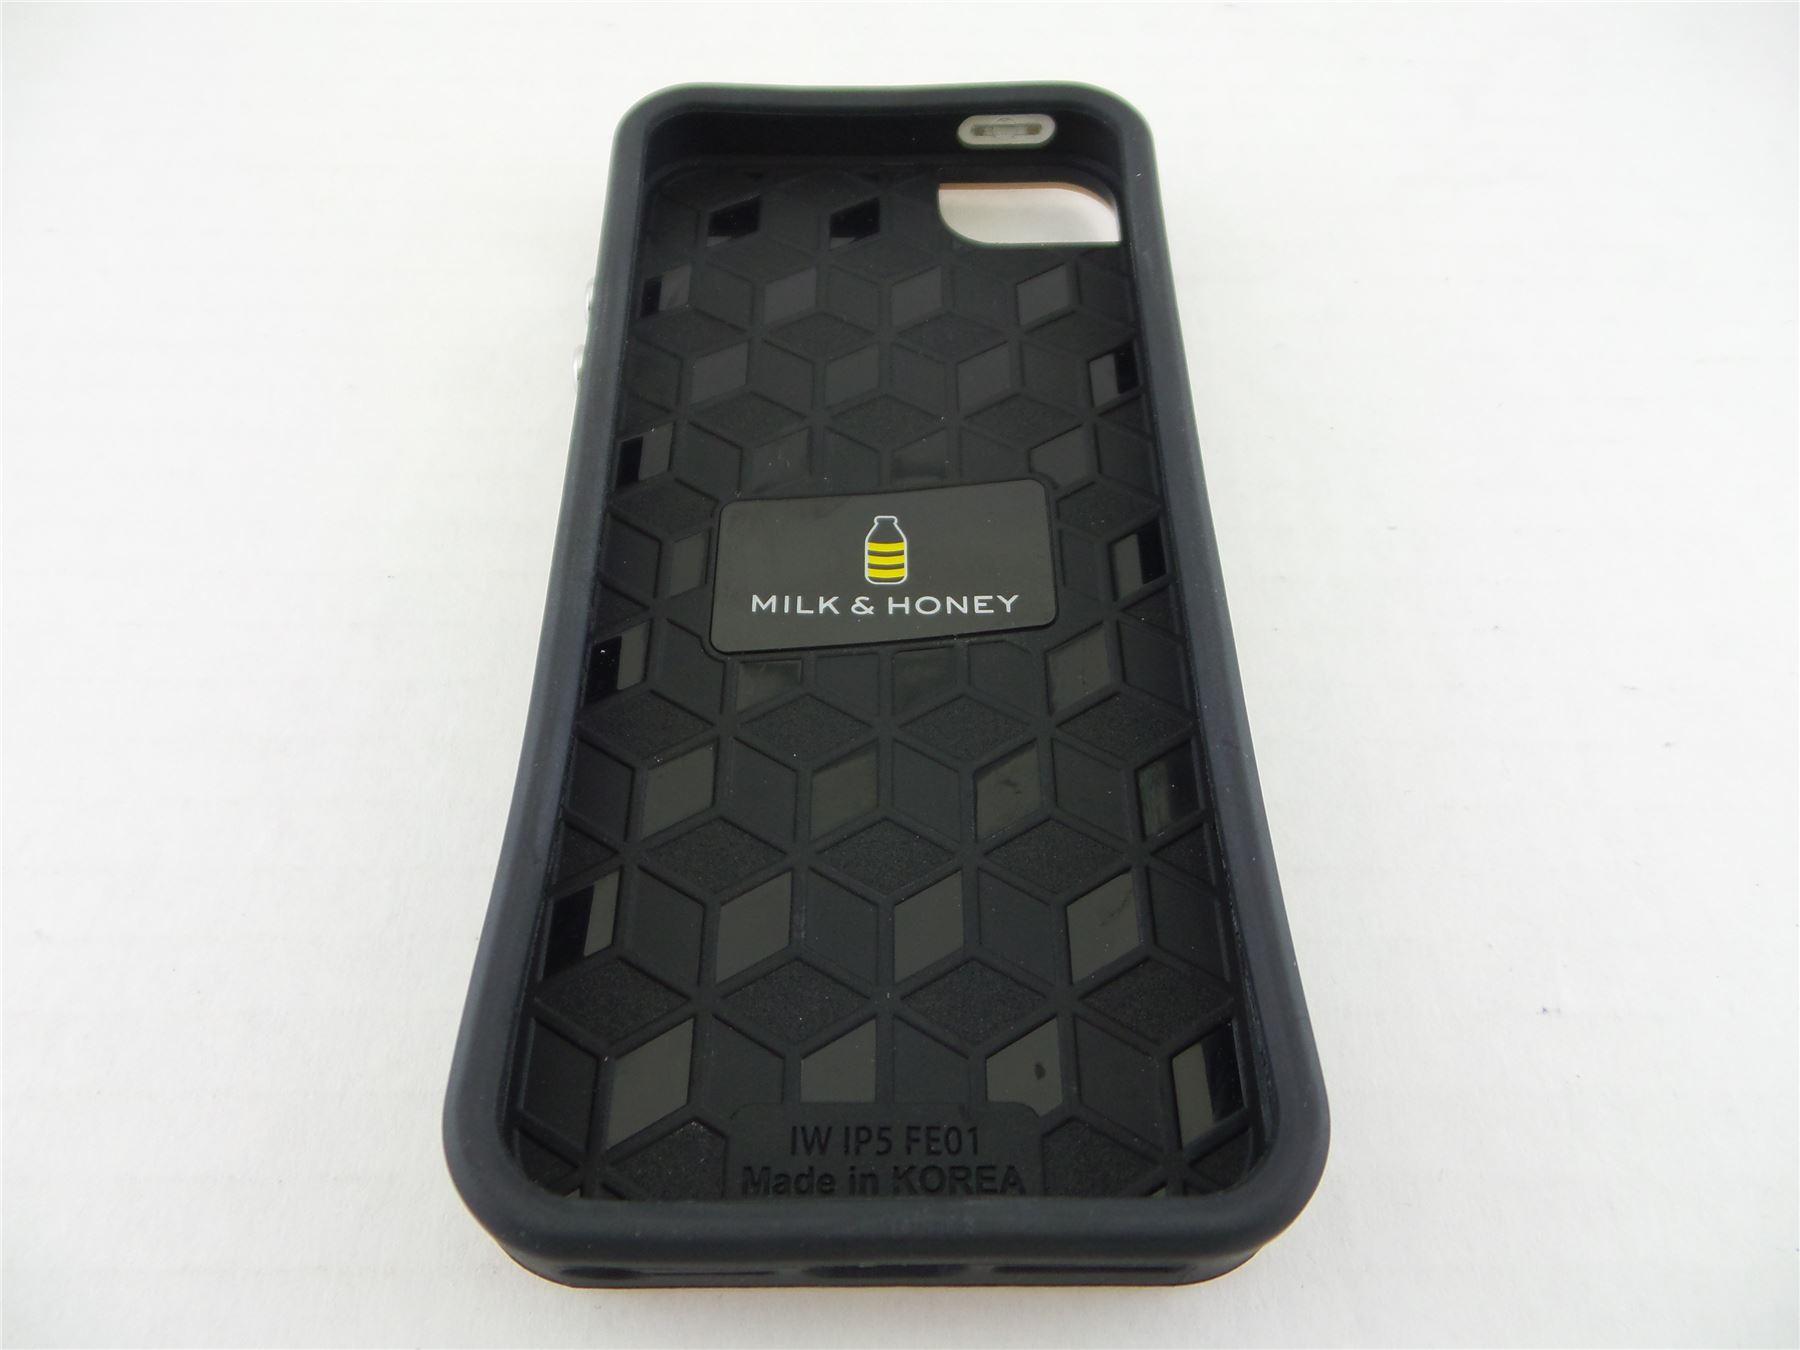 Iphone 5s Cases Gold Milk & Honey Wh...